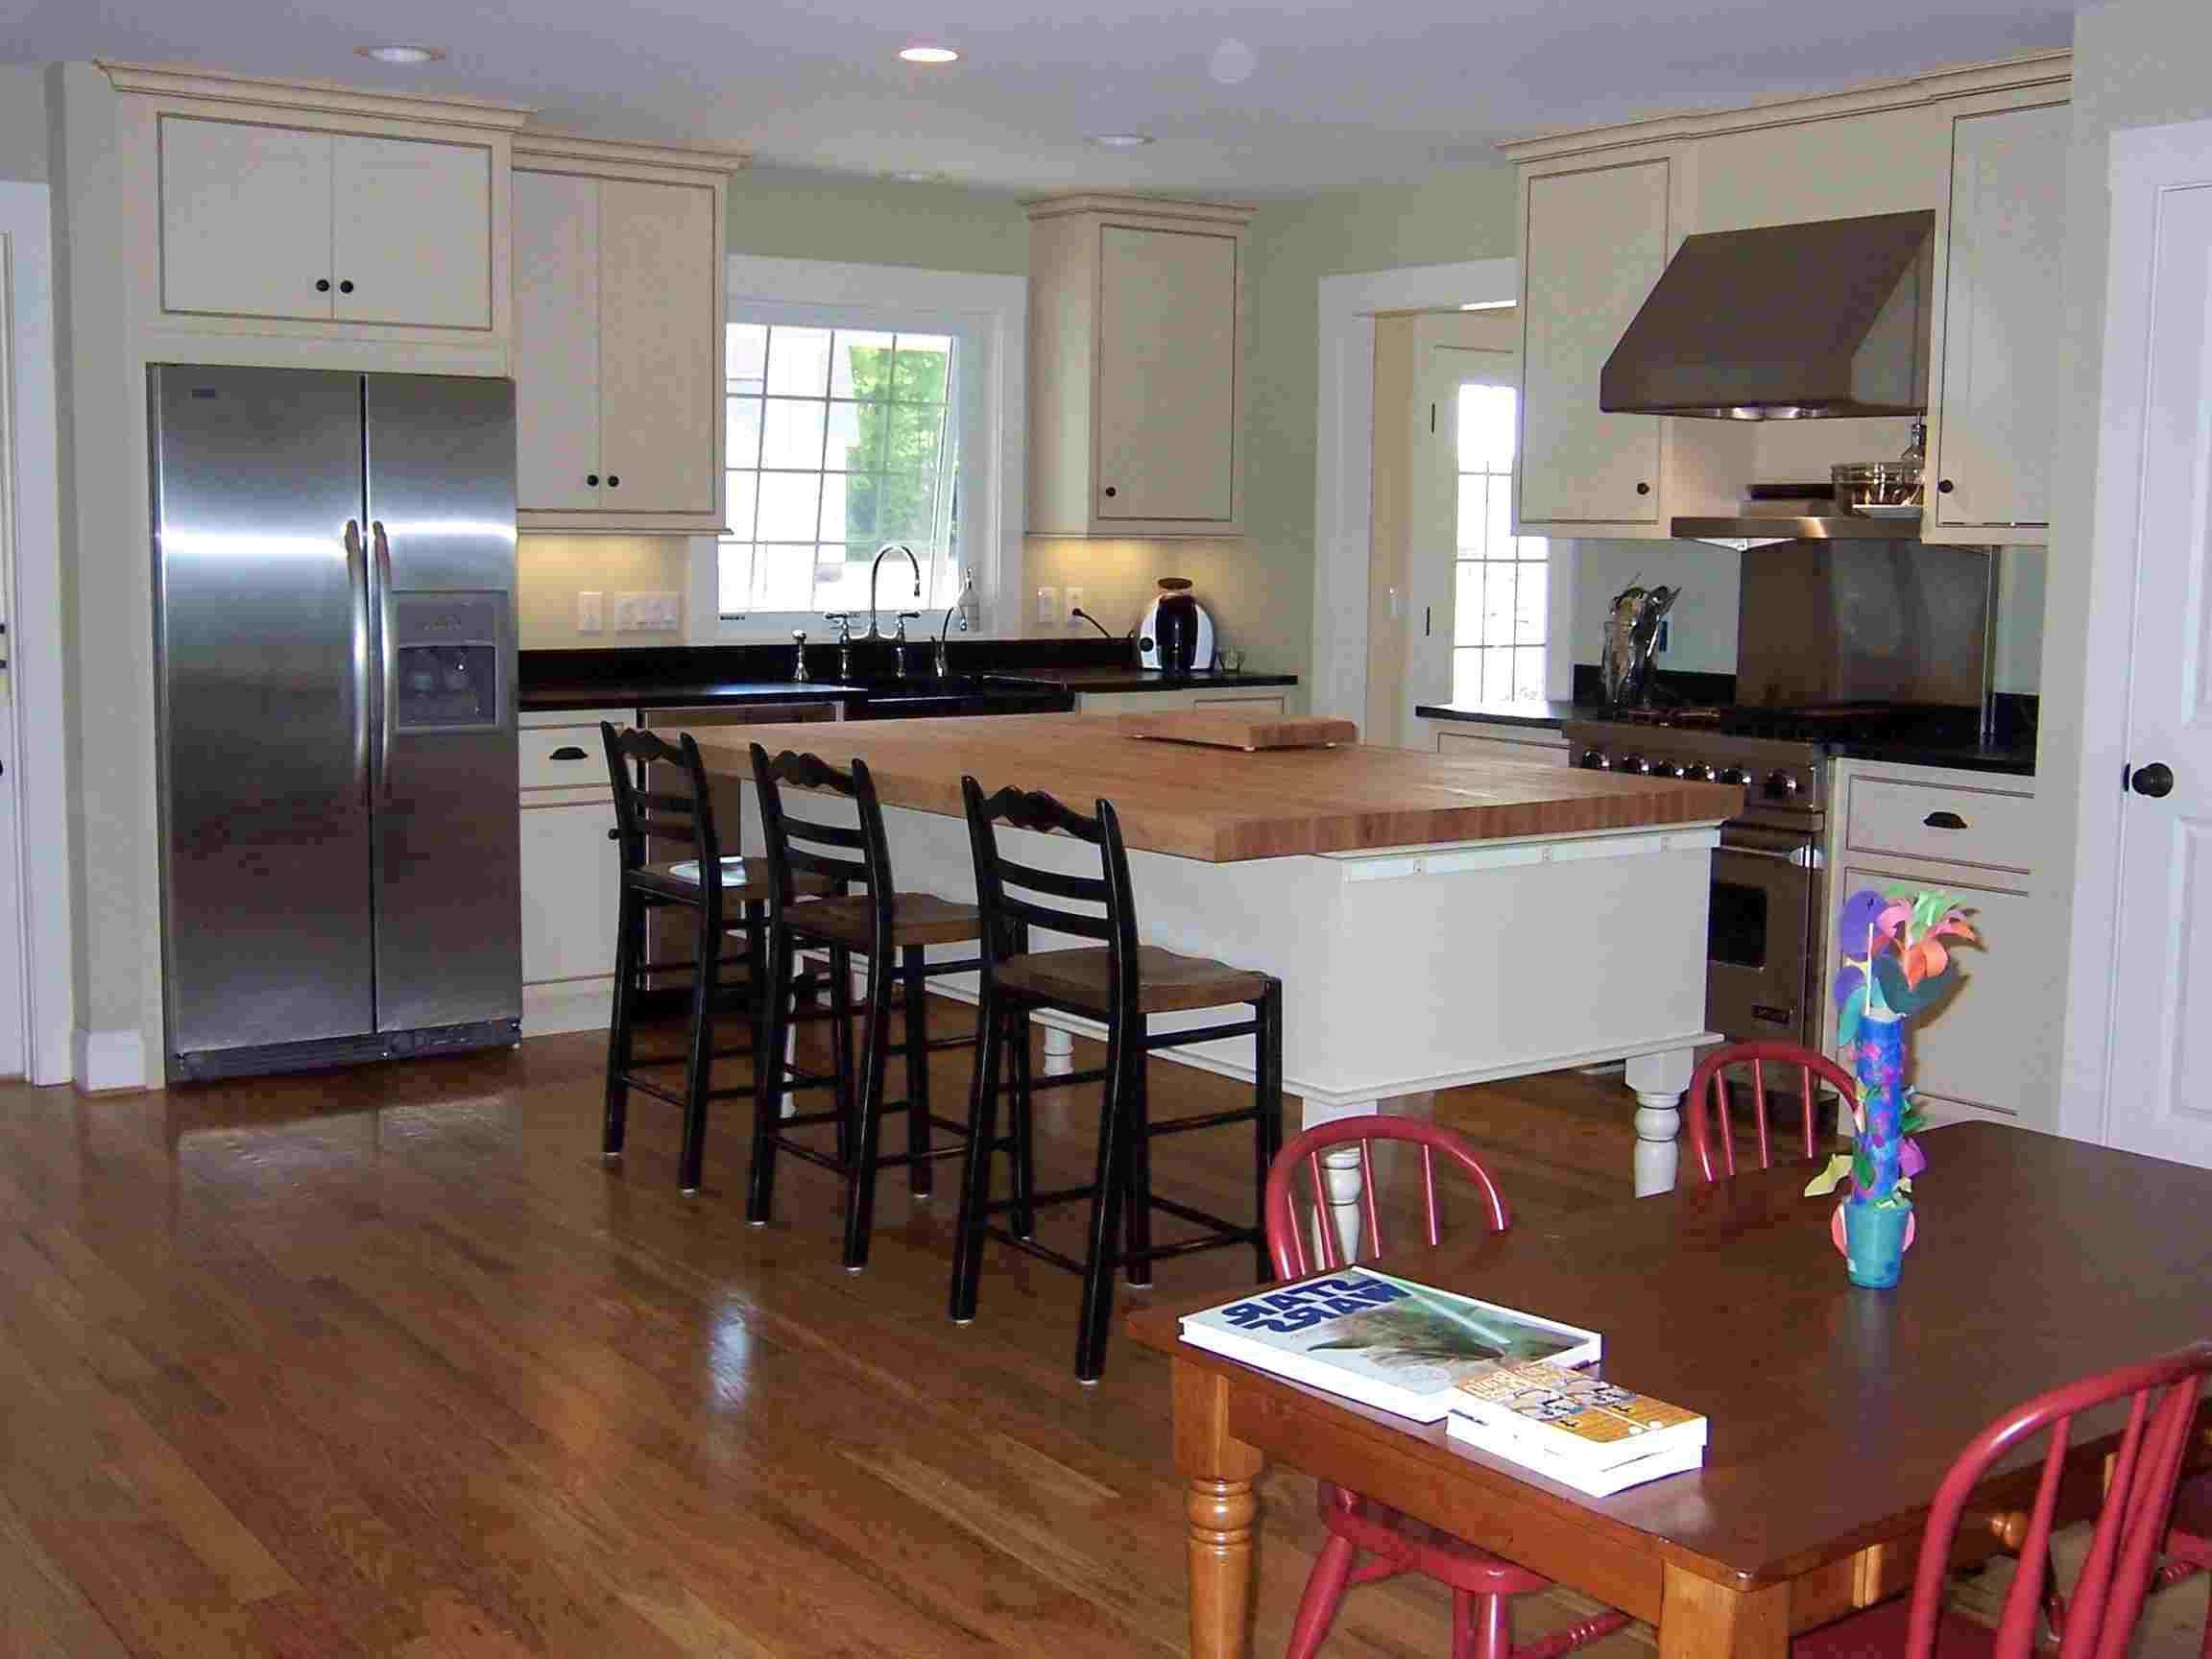 åbent køkken stue spisestue grundplan